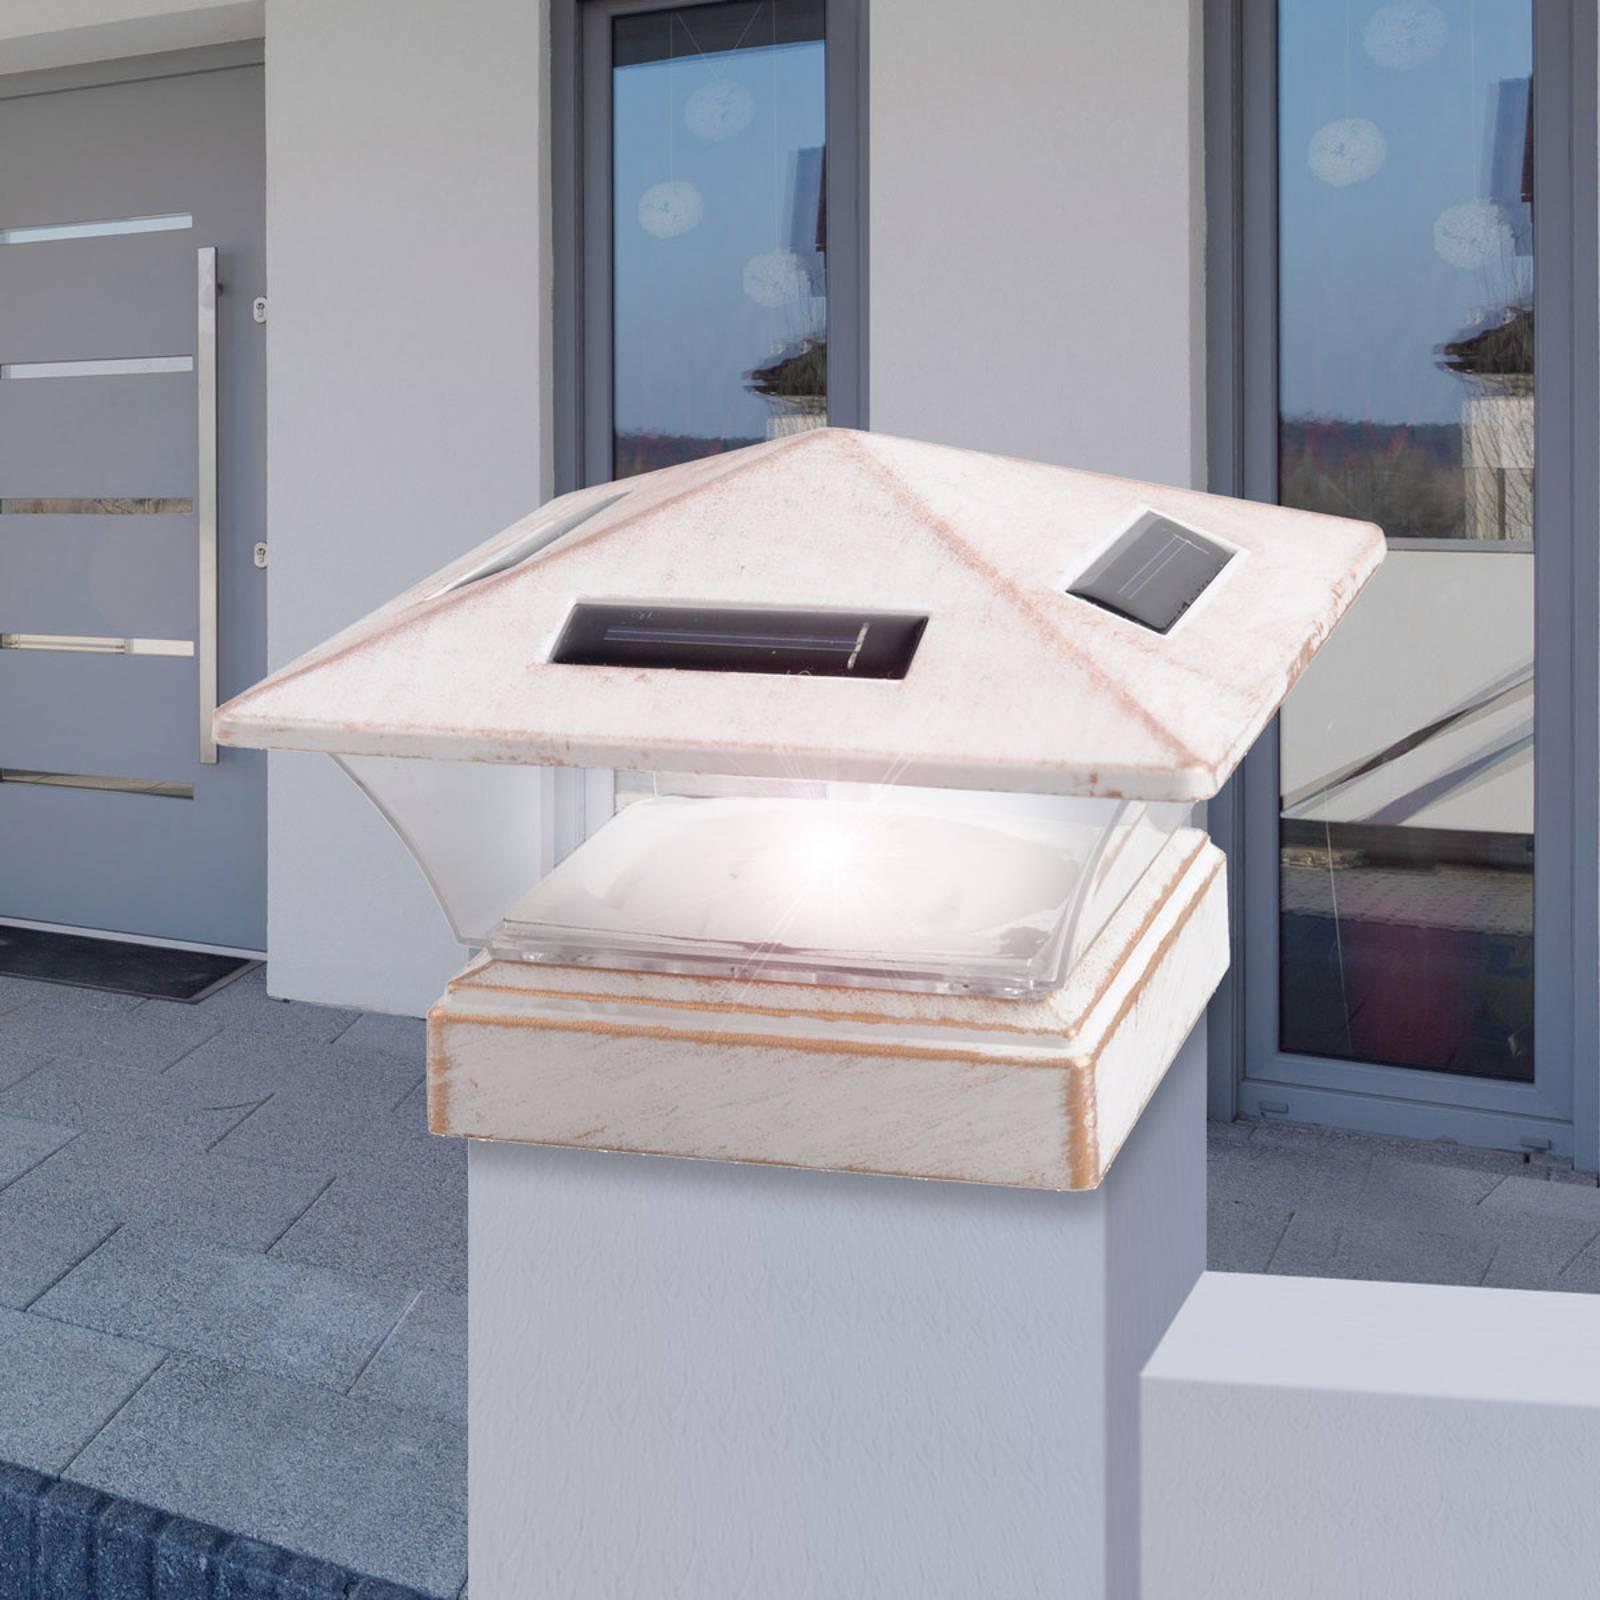 LED-Solarleuchte 33038, 15 x 15 cm, antik weiß